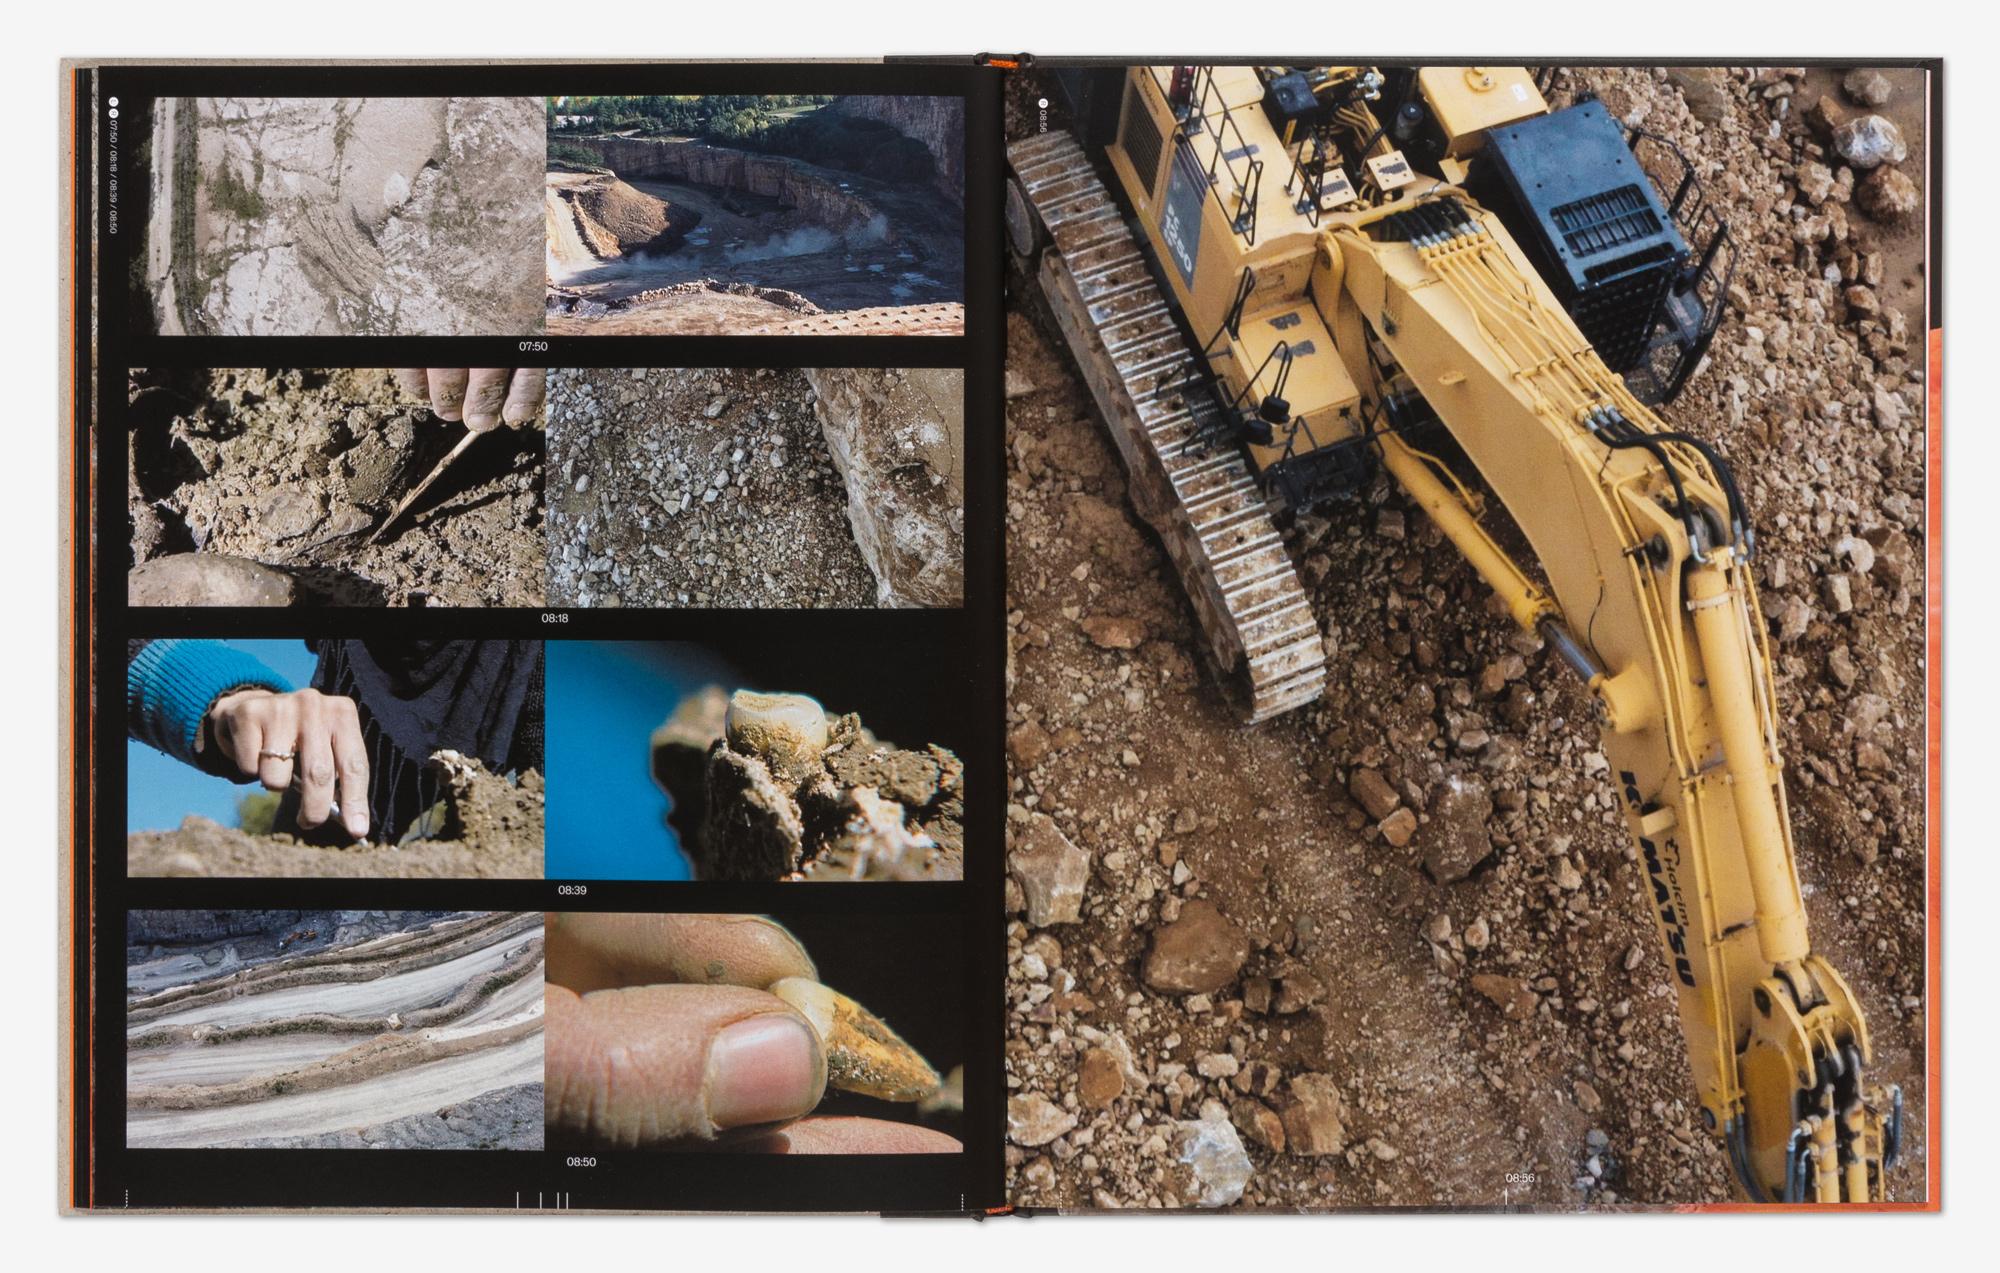 Acosta, I. Archaeology of Sacrifice Kunststiftung der ZF Friedrichshafen AG and modo Verlag GmbH, Freiburg, Germany, 2020